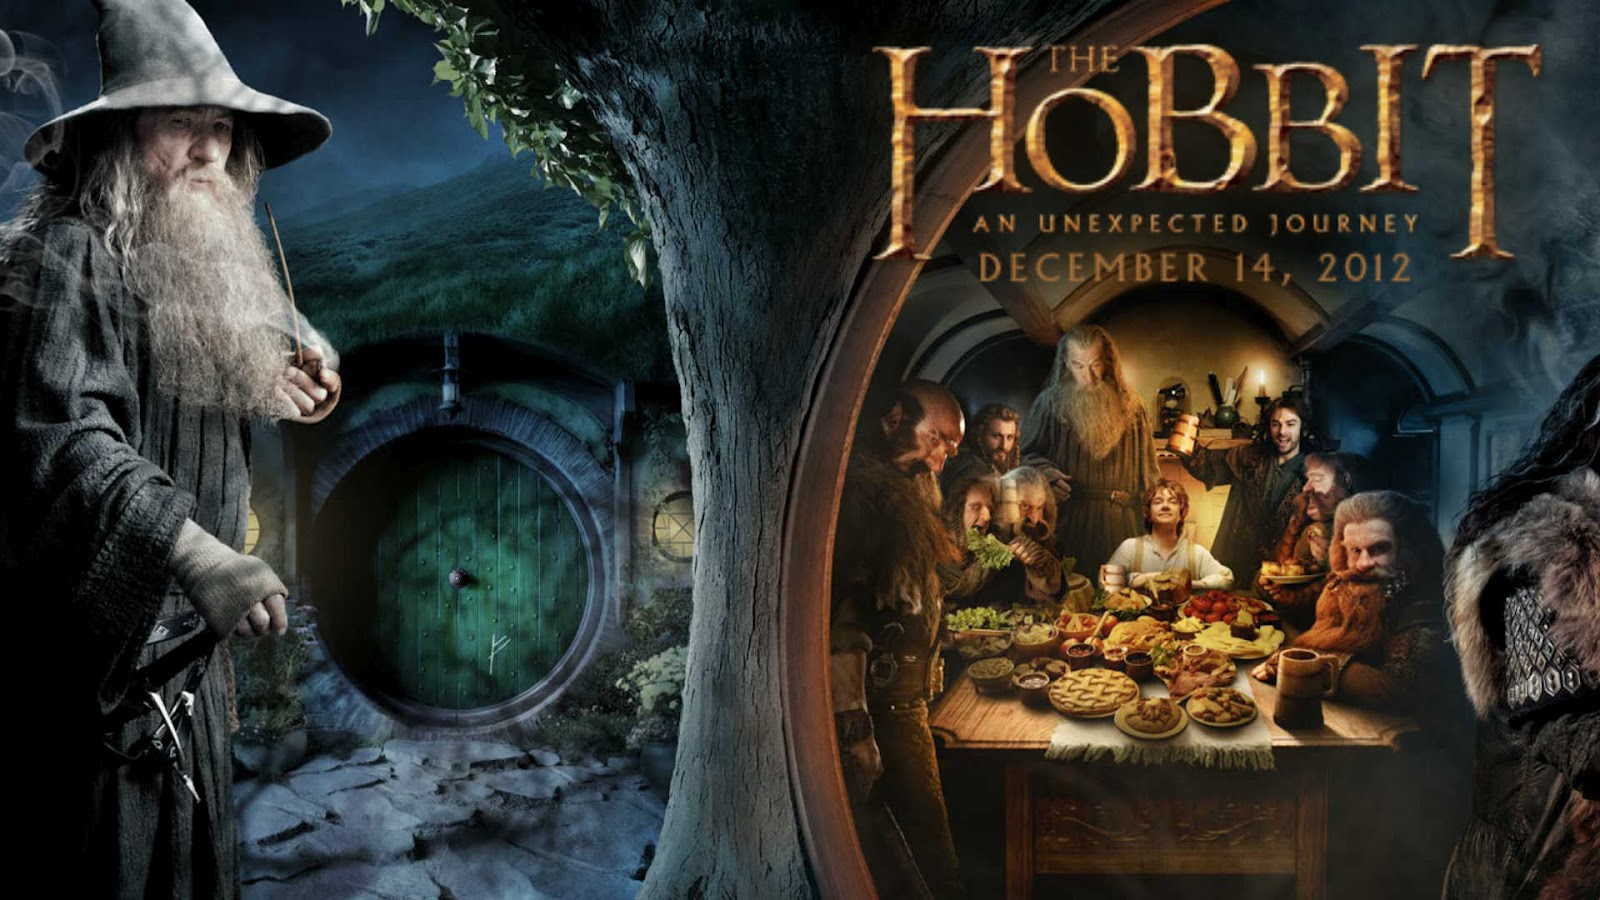 the hobbit scroll 1600x900